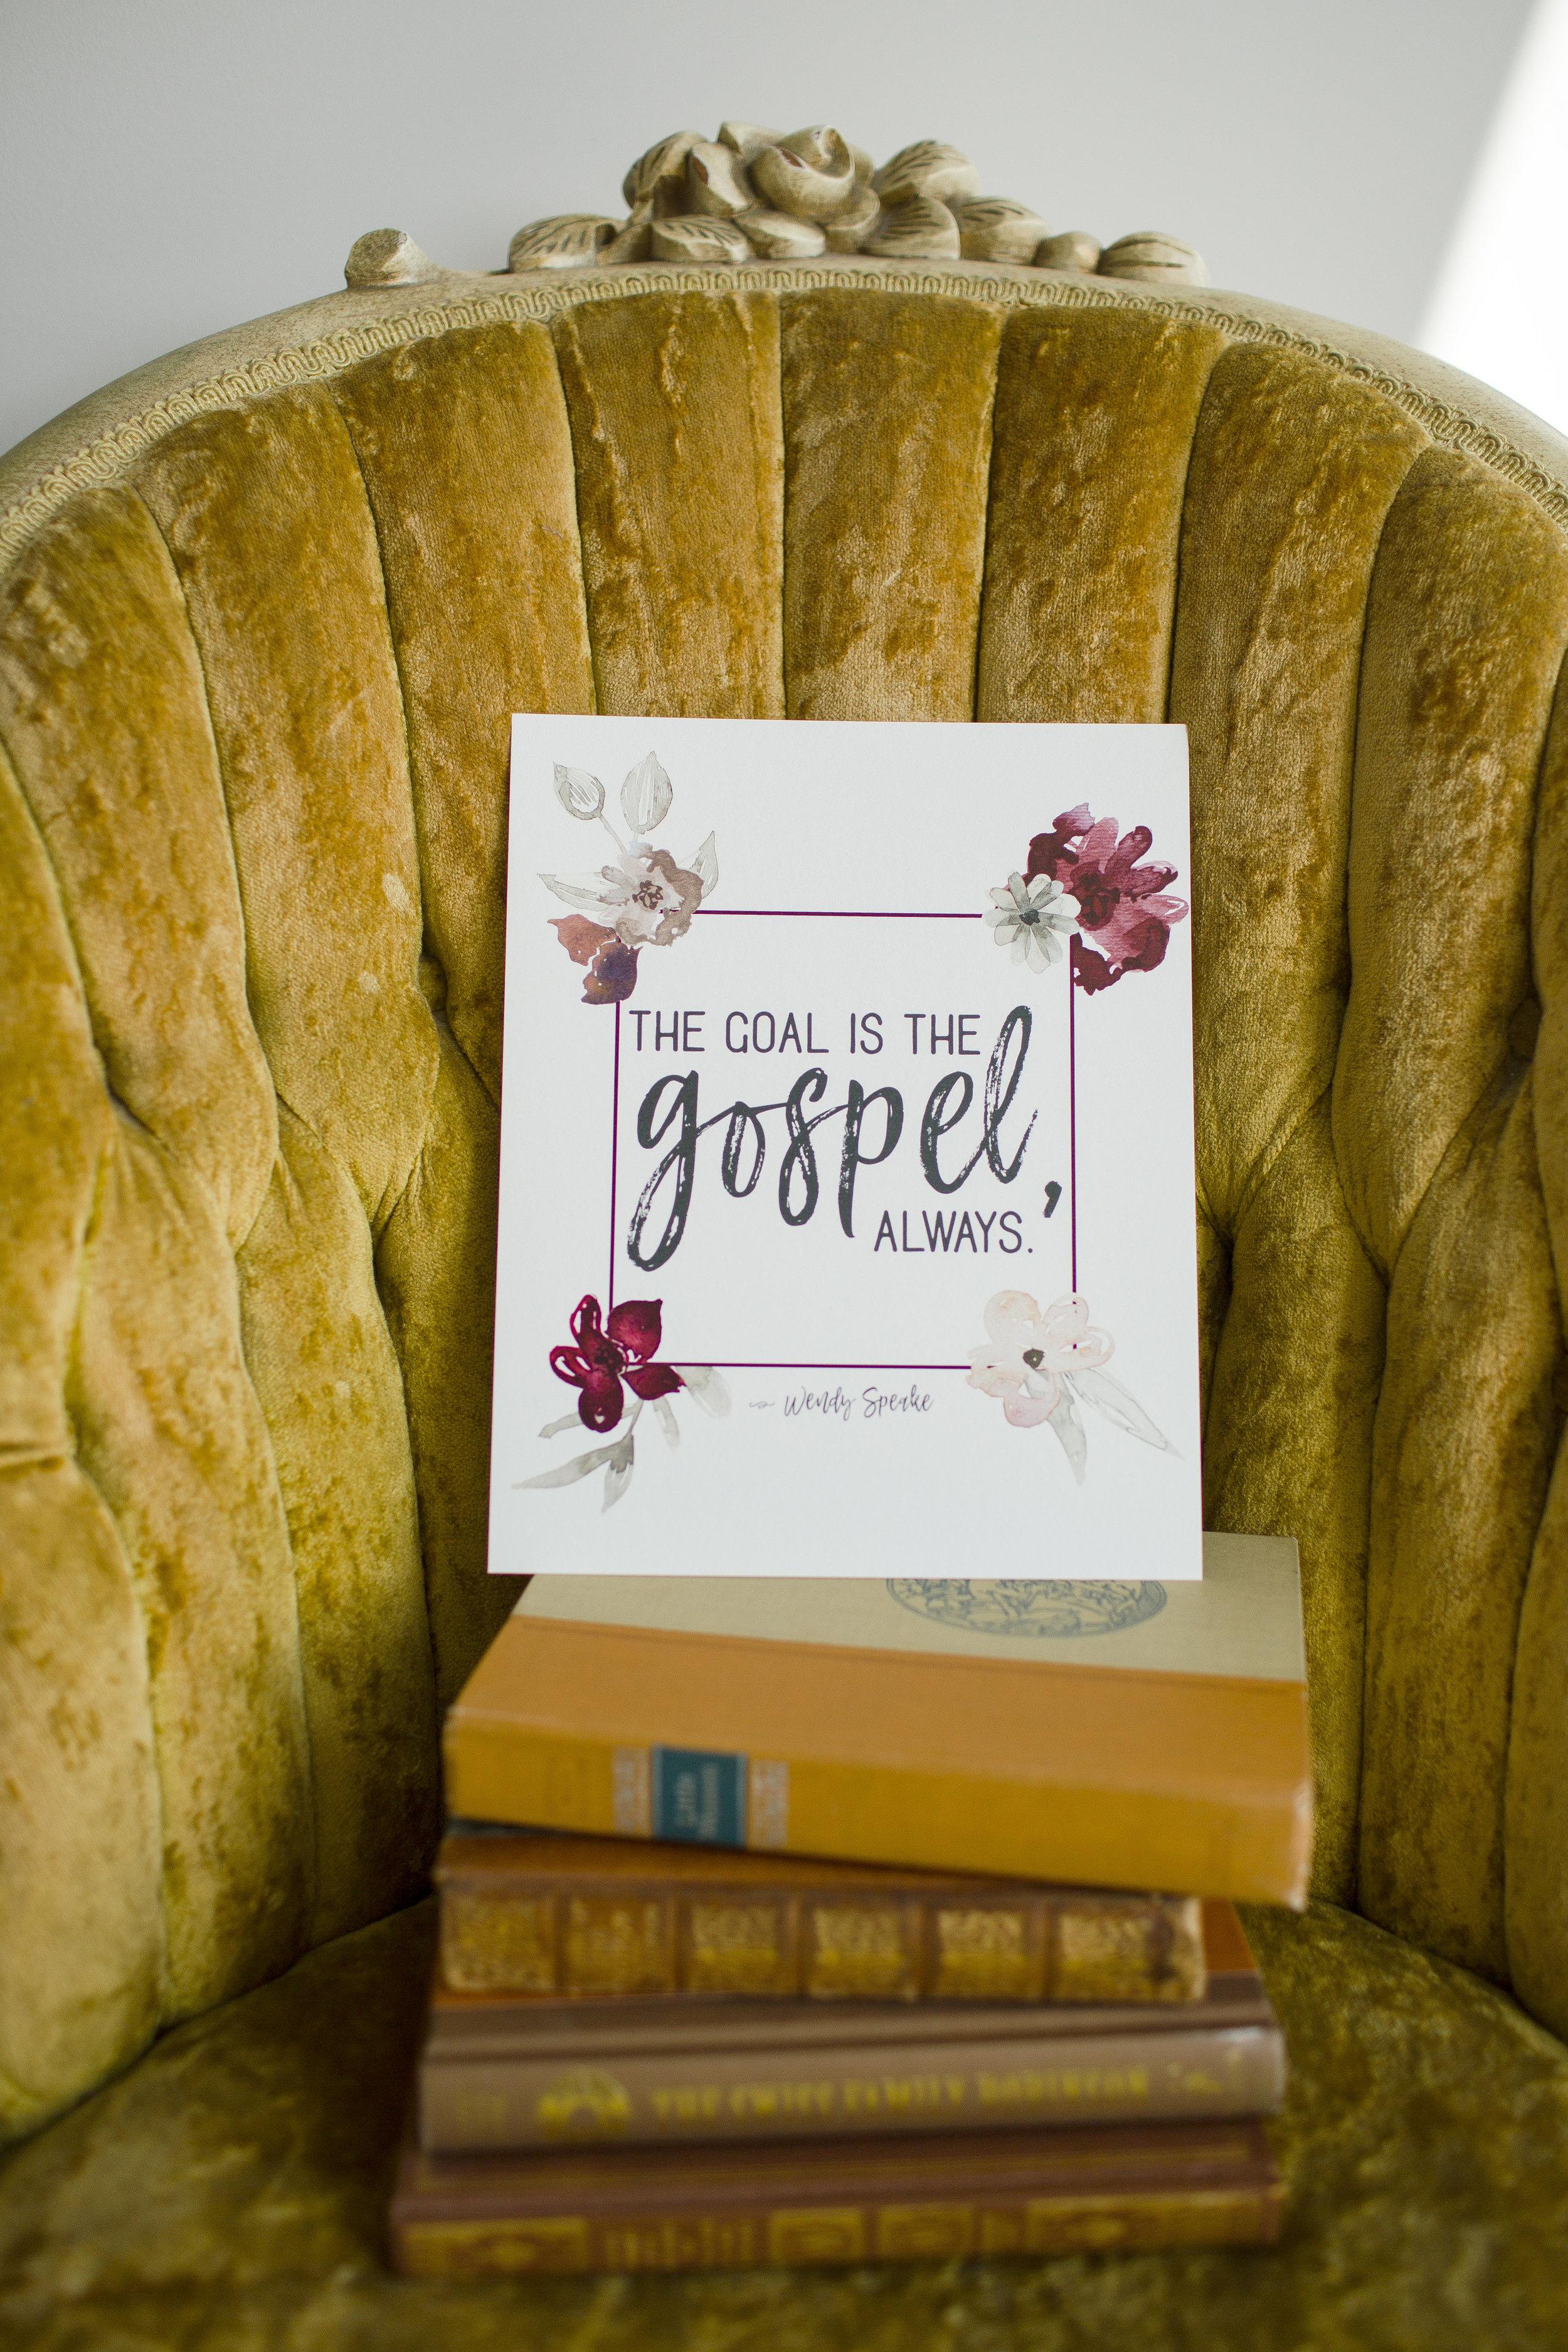 The Goal is the Gospel, Always — Free Prints from WendySpeake.com